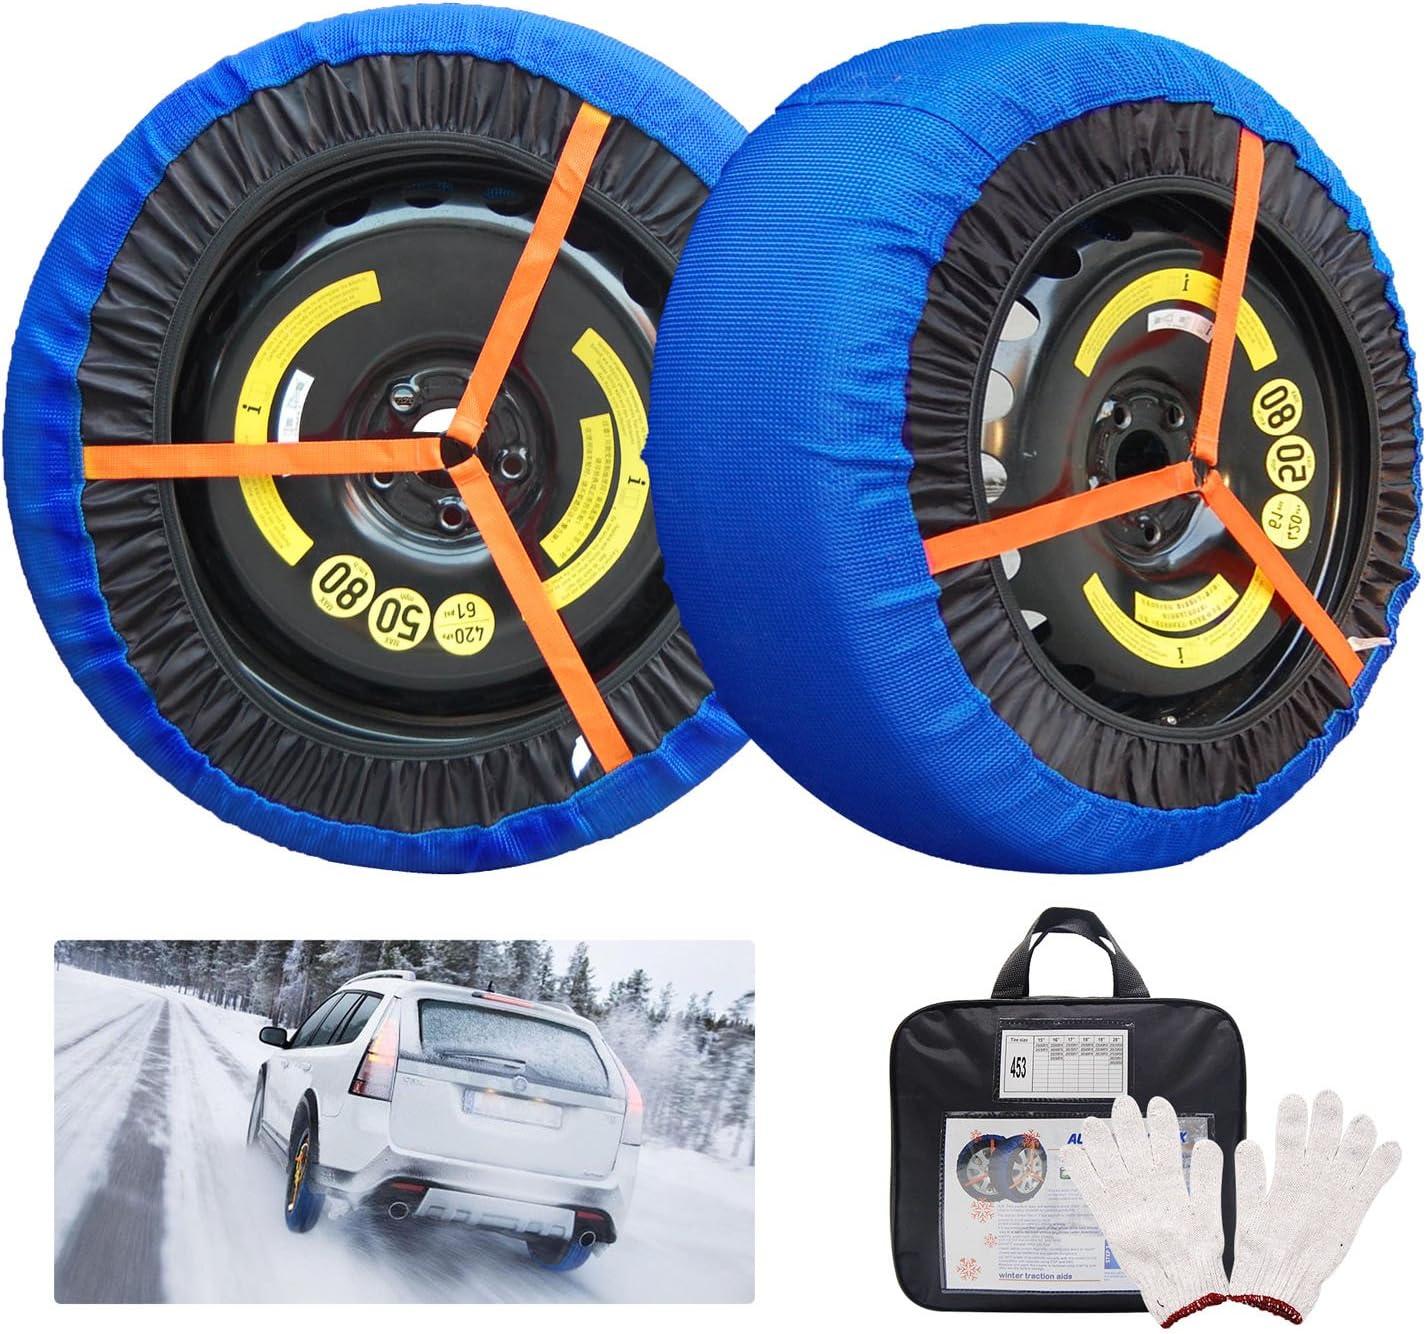 JSHANMEI Snow Socks Traction Adjustable Car Tire Cover Socks Tire Chains Alternative Anti Slip Winter Traction Aid Snow Sock (49)